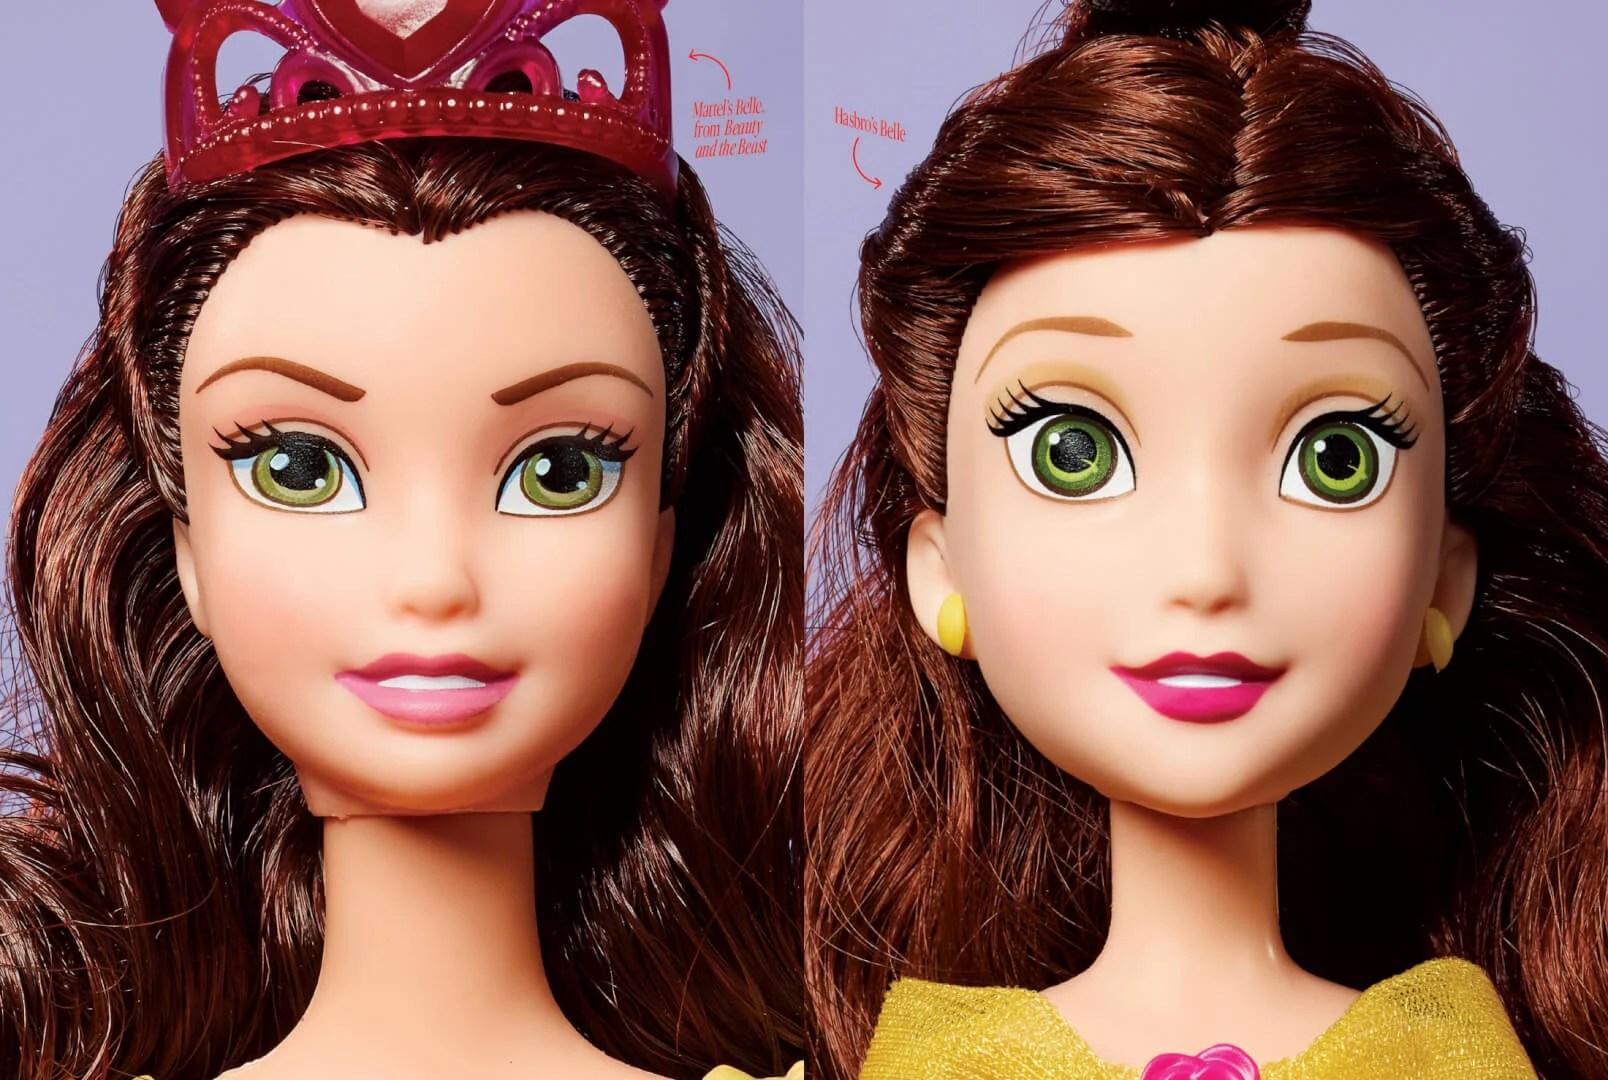 Hasbro S Takeover Of The 500 Million Disney Princess Doll